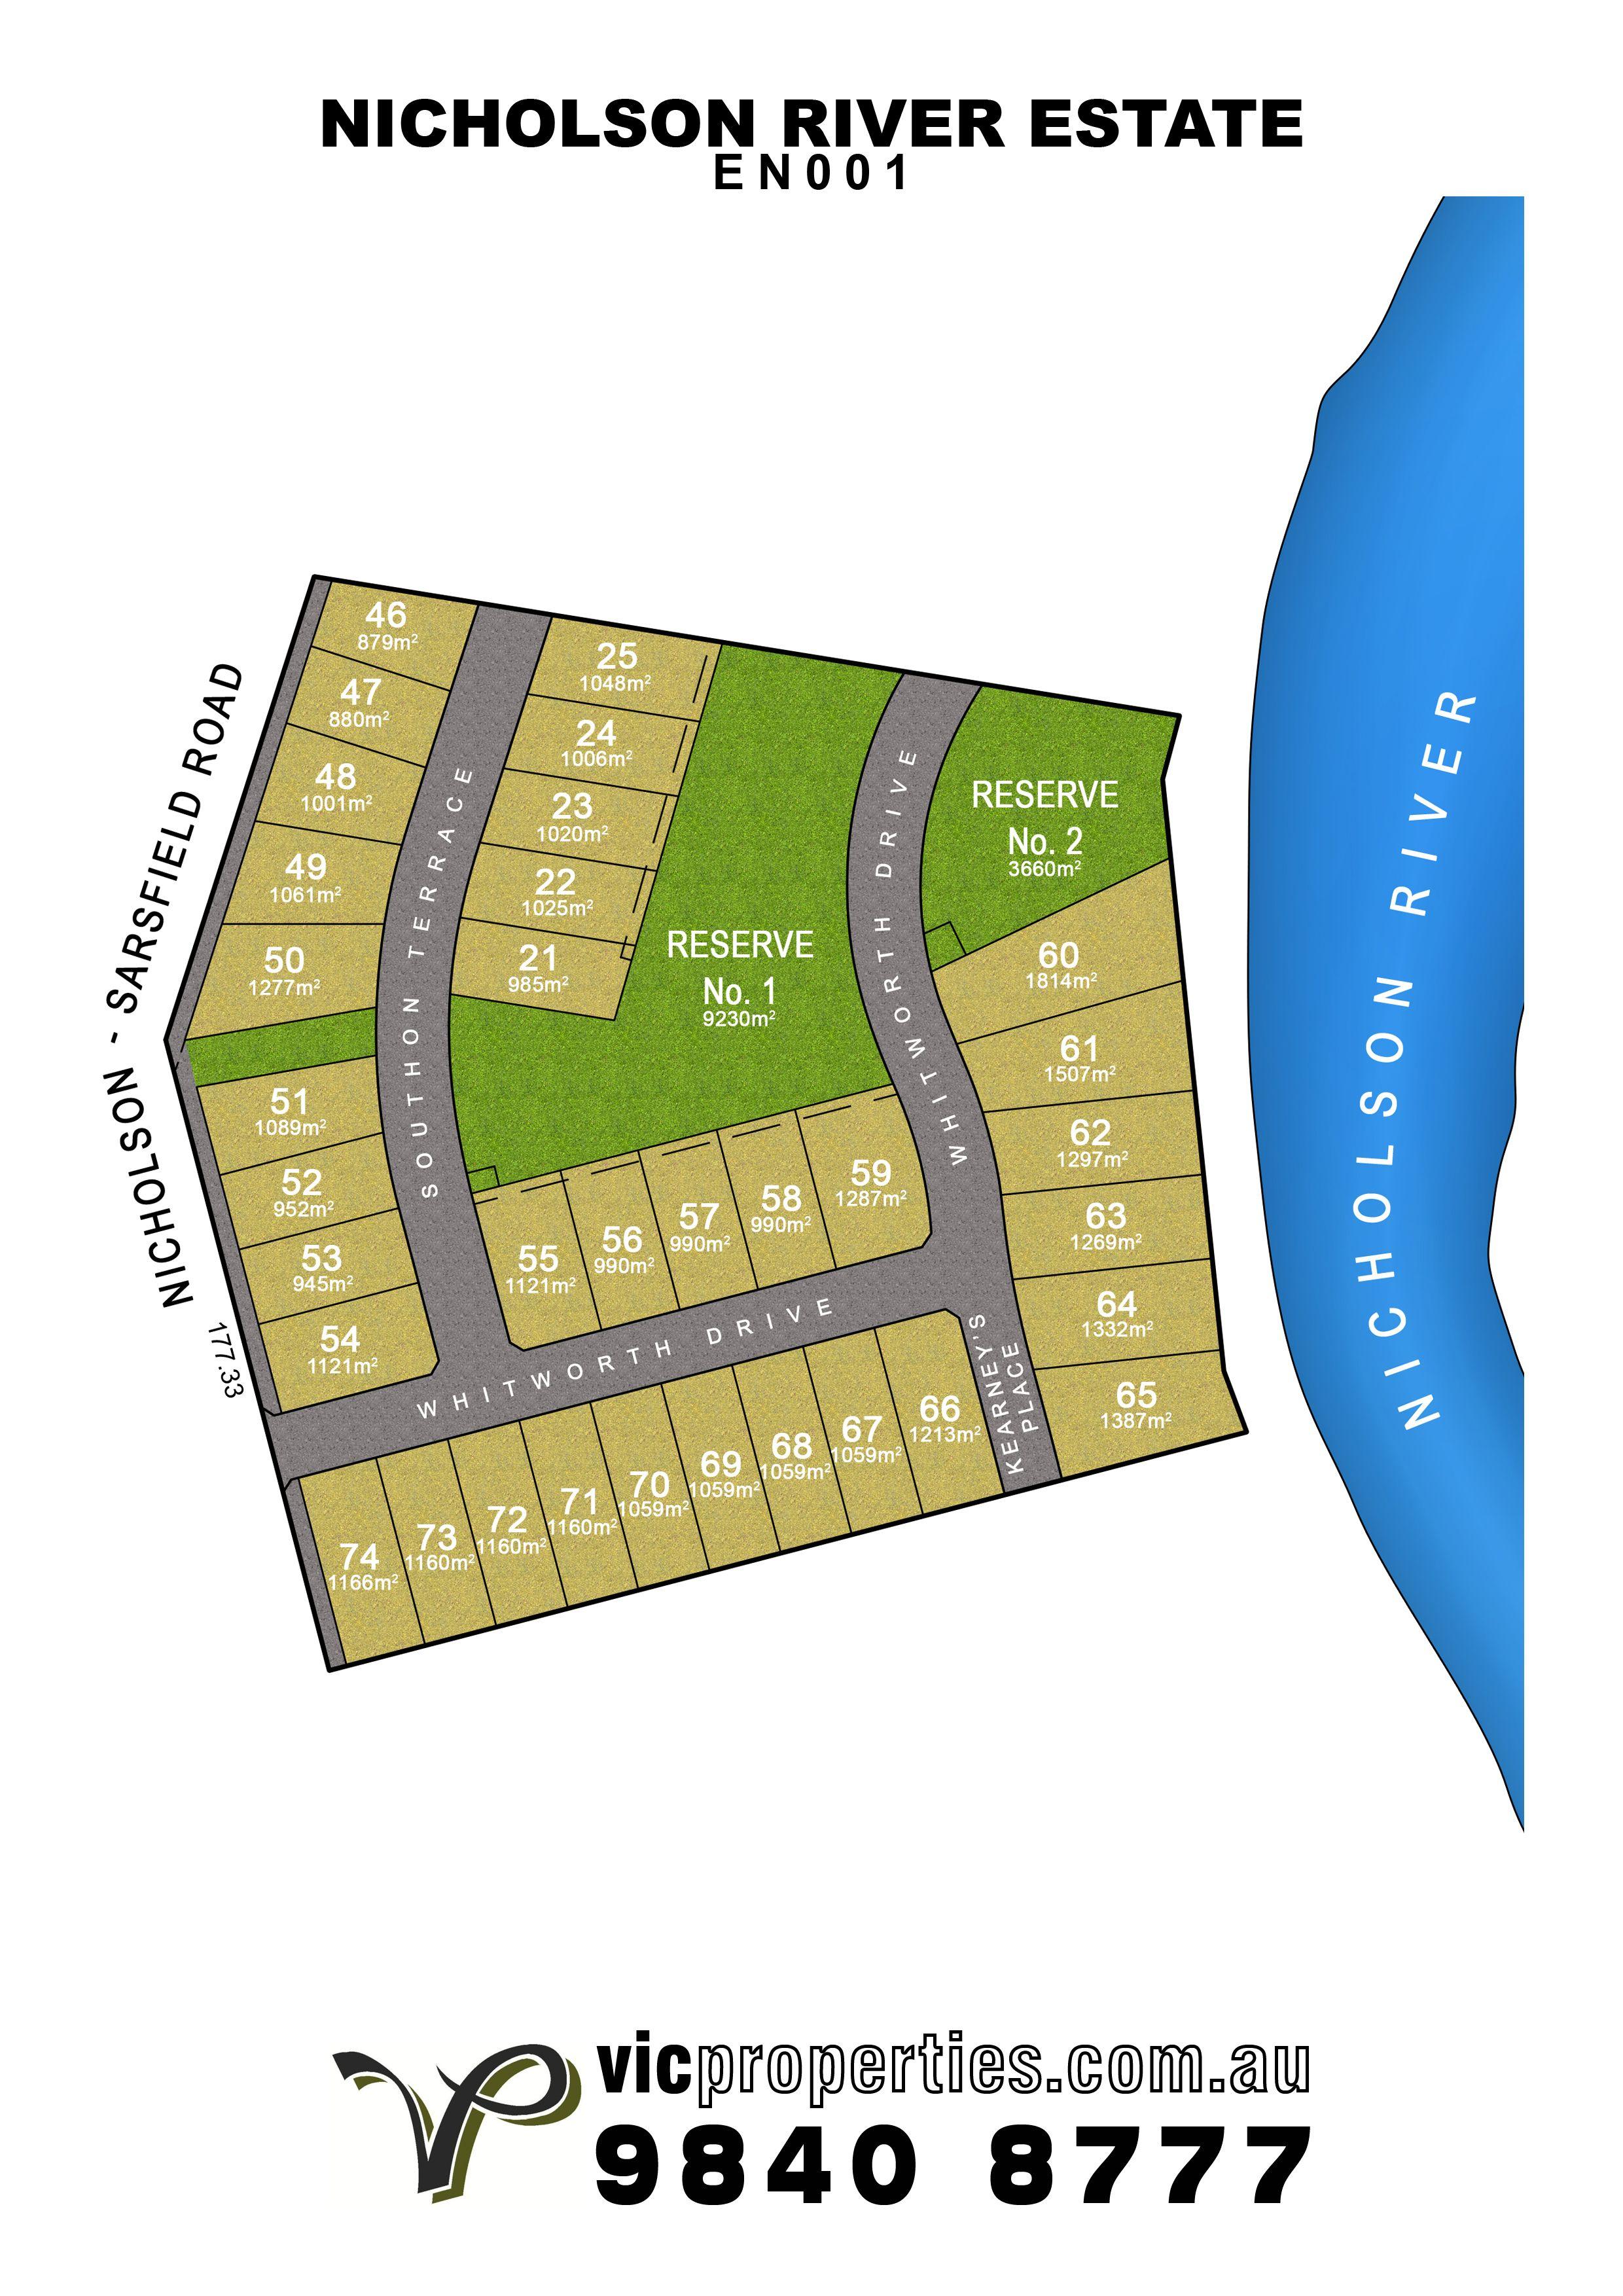 Lot 73/4 Whitworth Drive, Nicholson VIC 3882